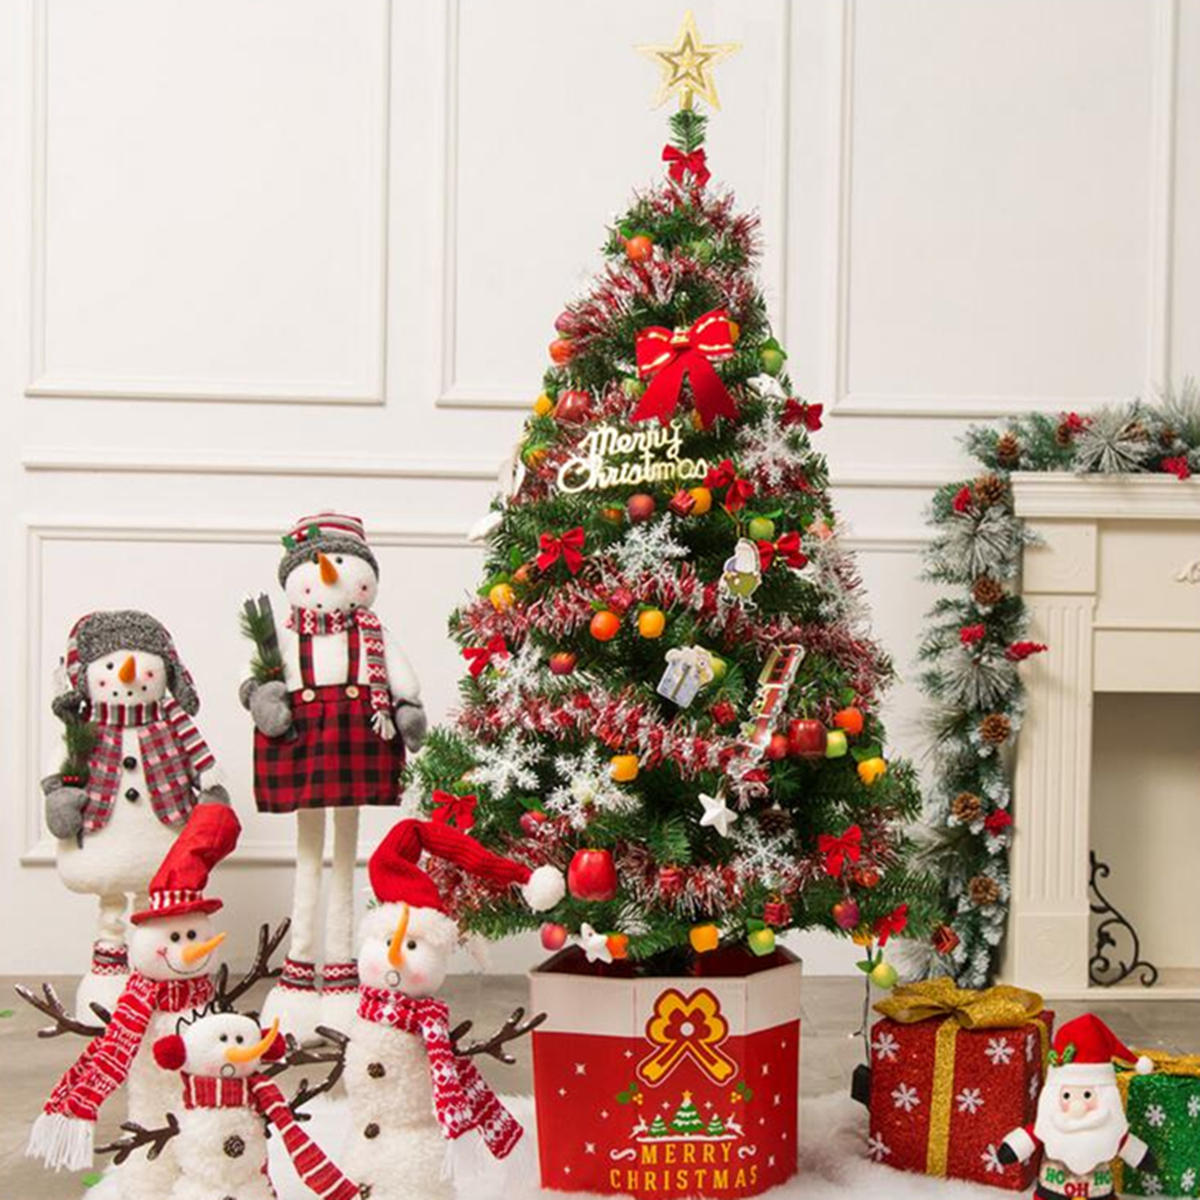 Christmas Tree Fiber Optic Lights: 3-7ft Pre-lit Fiber Optic Artificial Christmas Tree